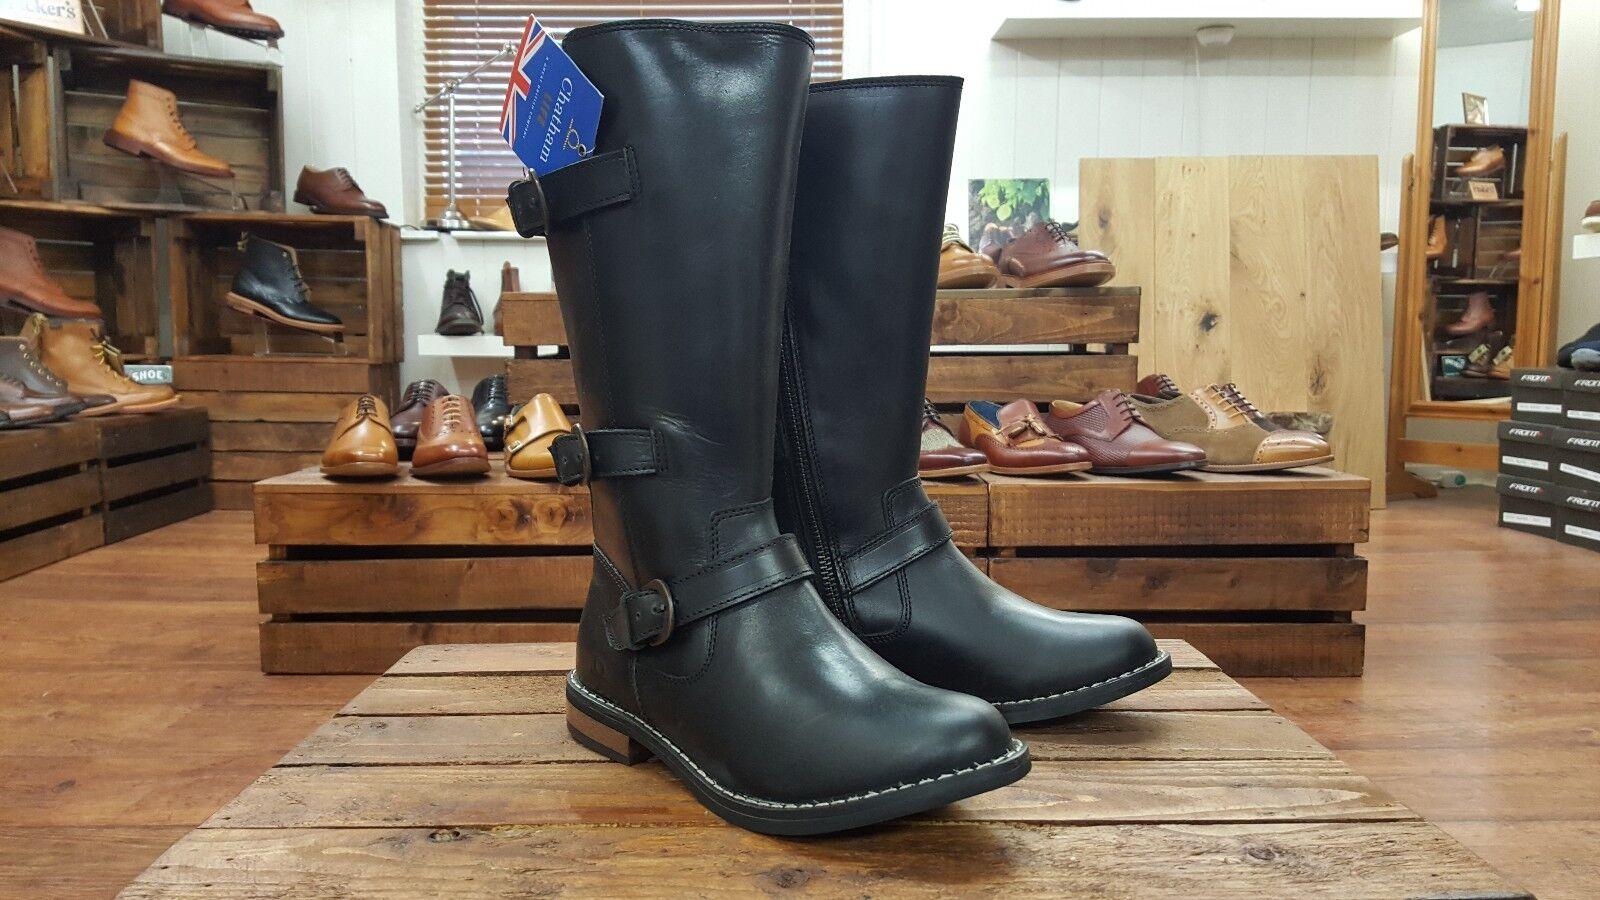 Chatham    Faye    Negro botas para mujer Becerro Alta    rojoucido fue